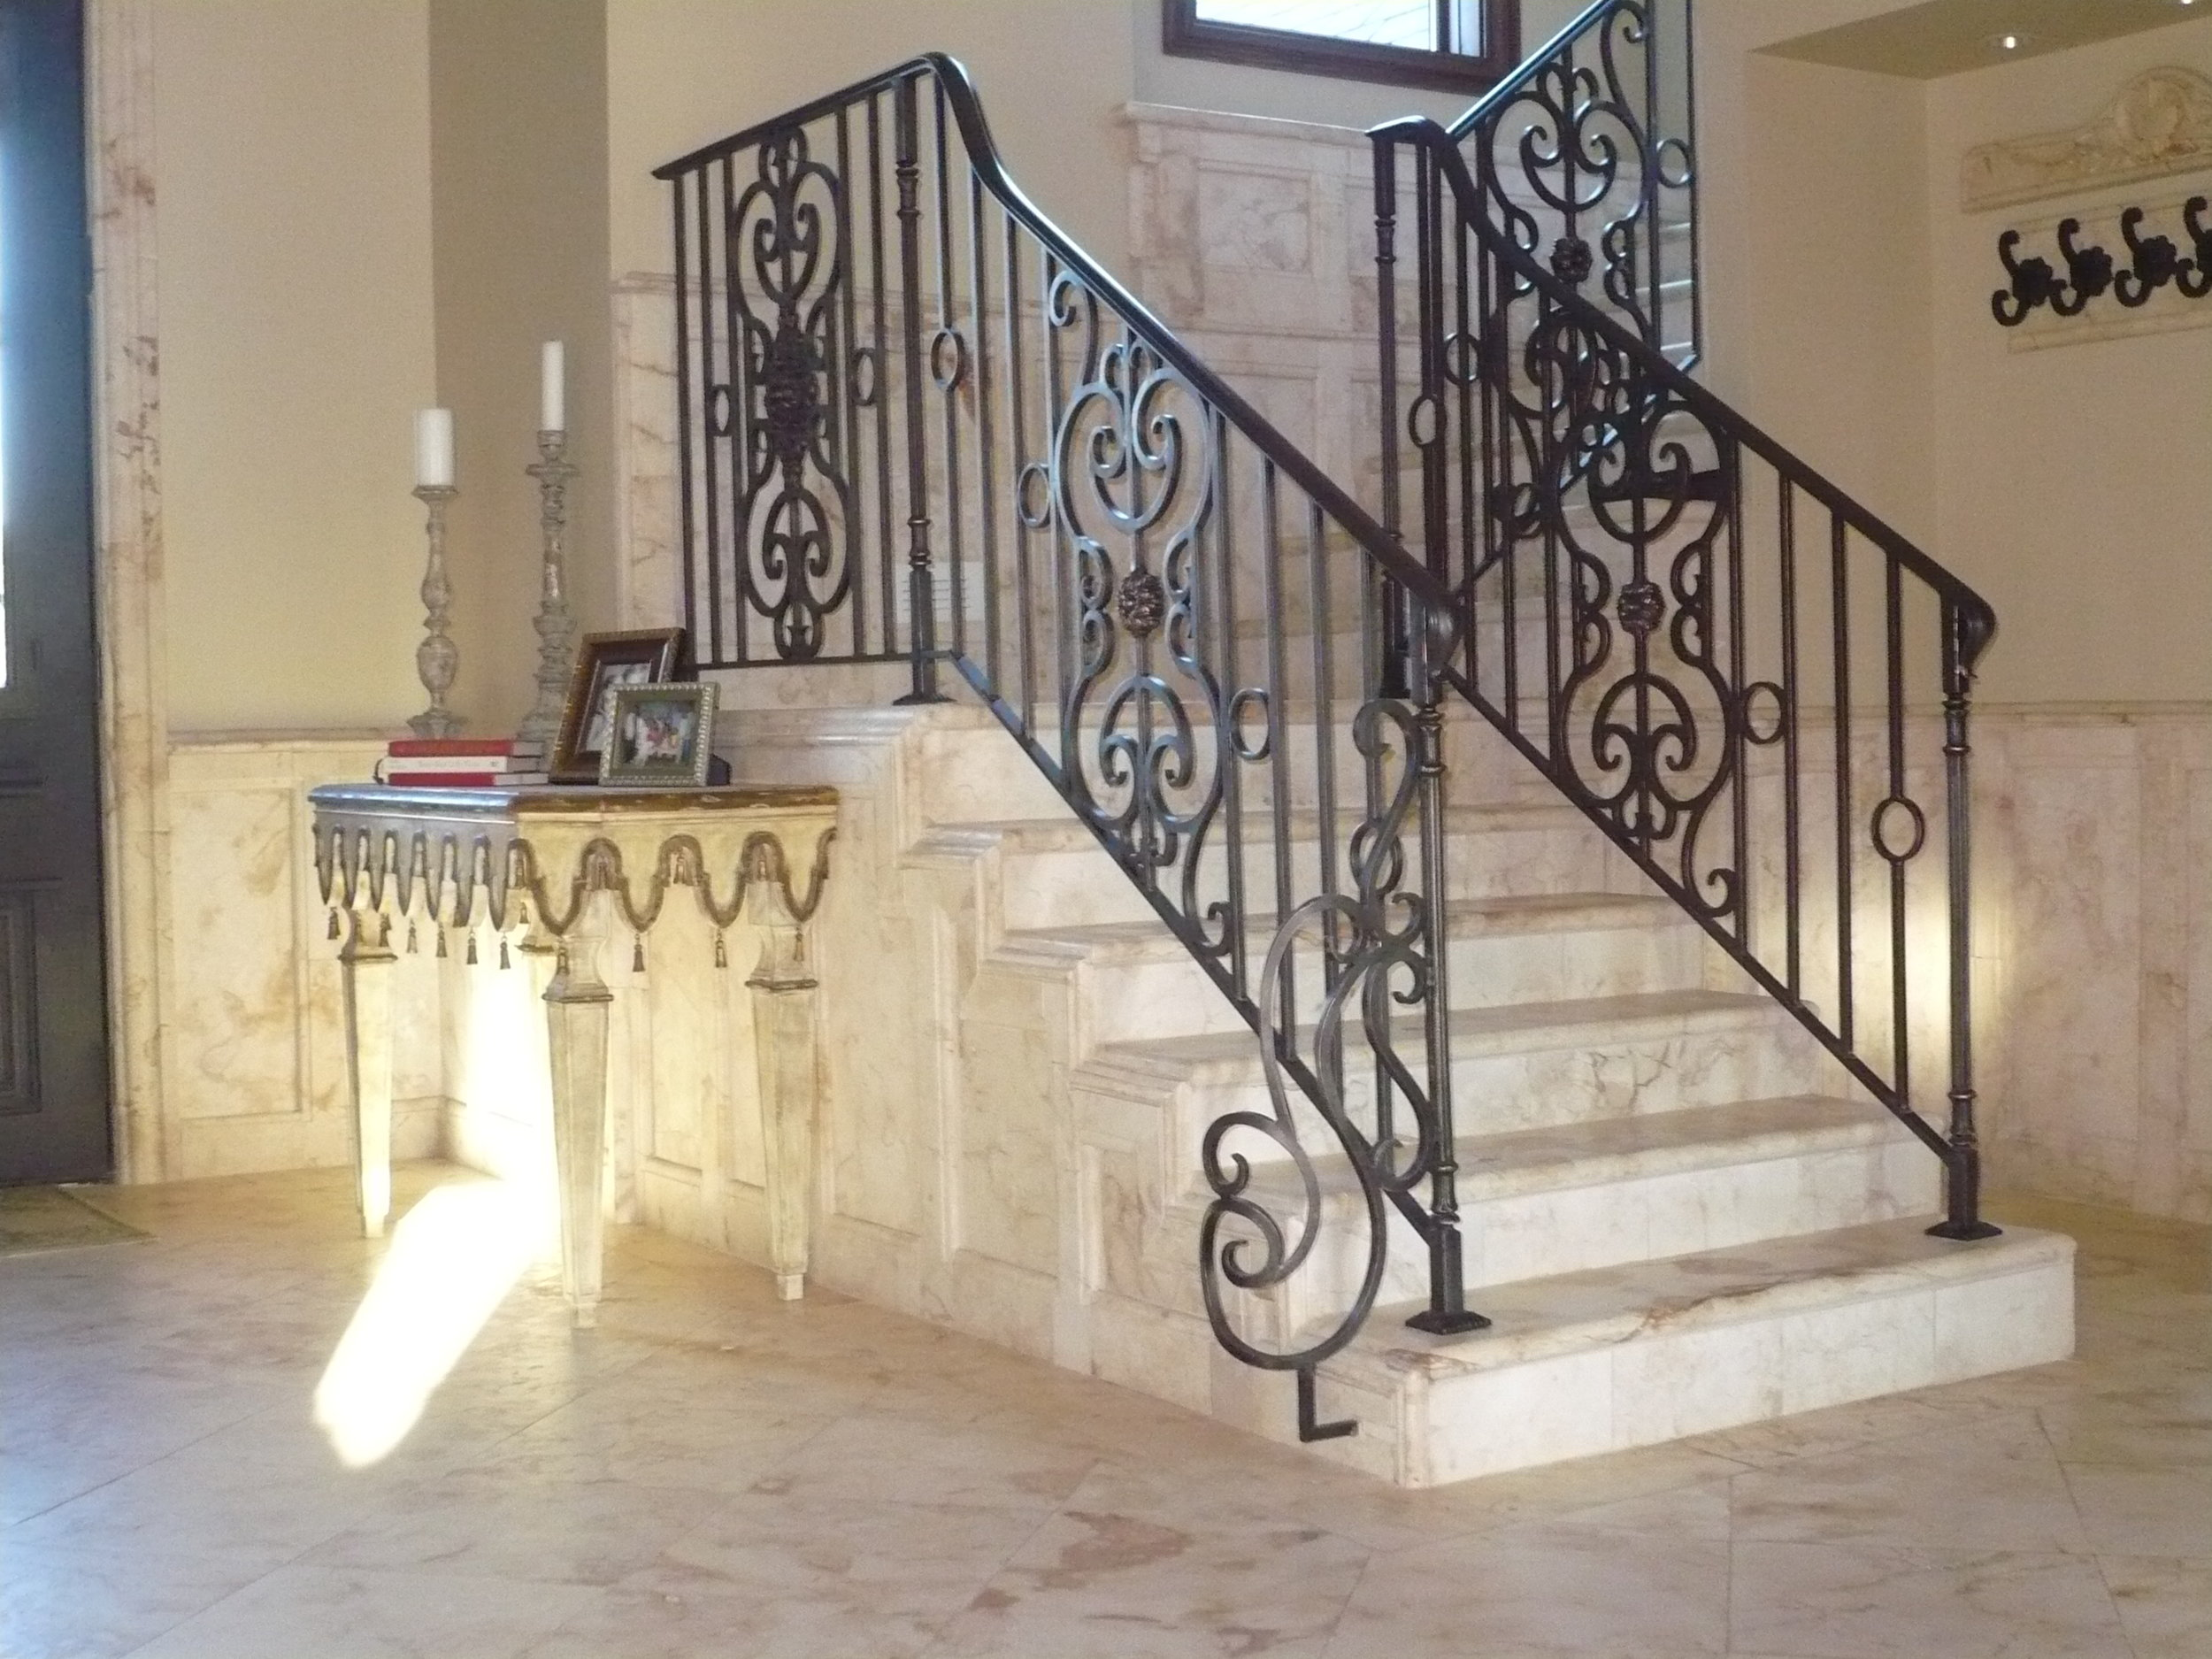 Leto_staircase P1060259.JPG